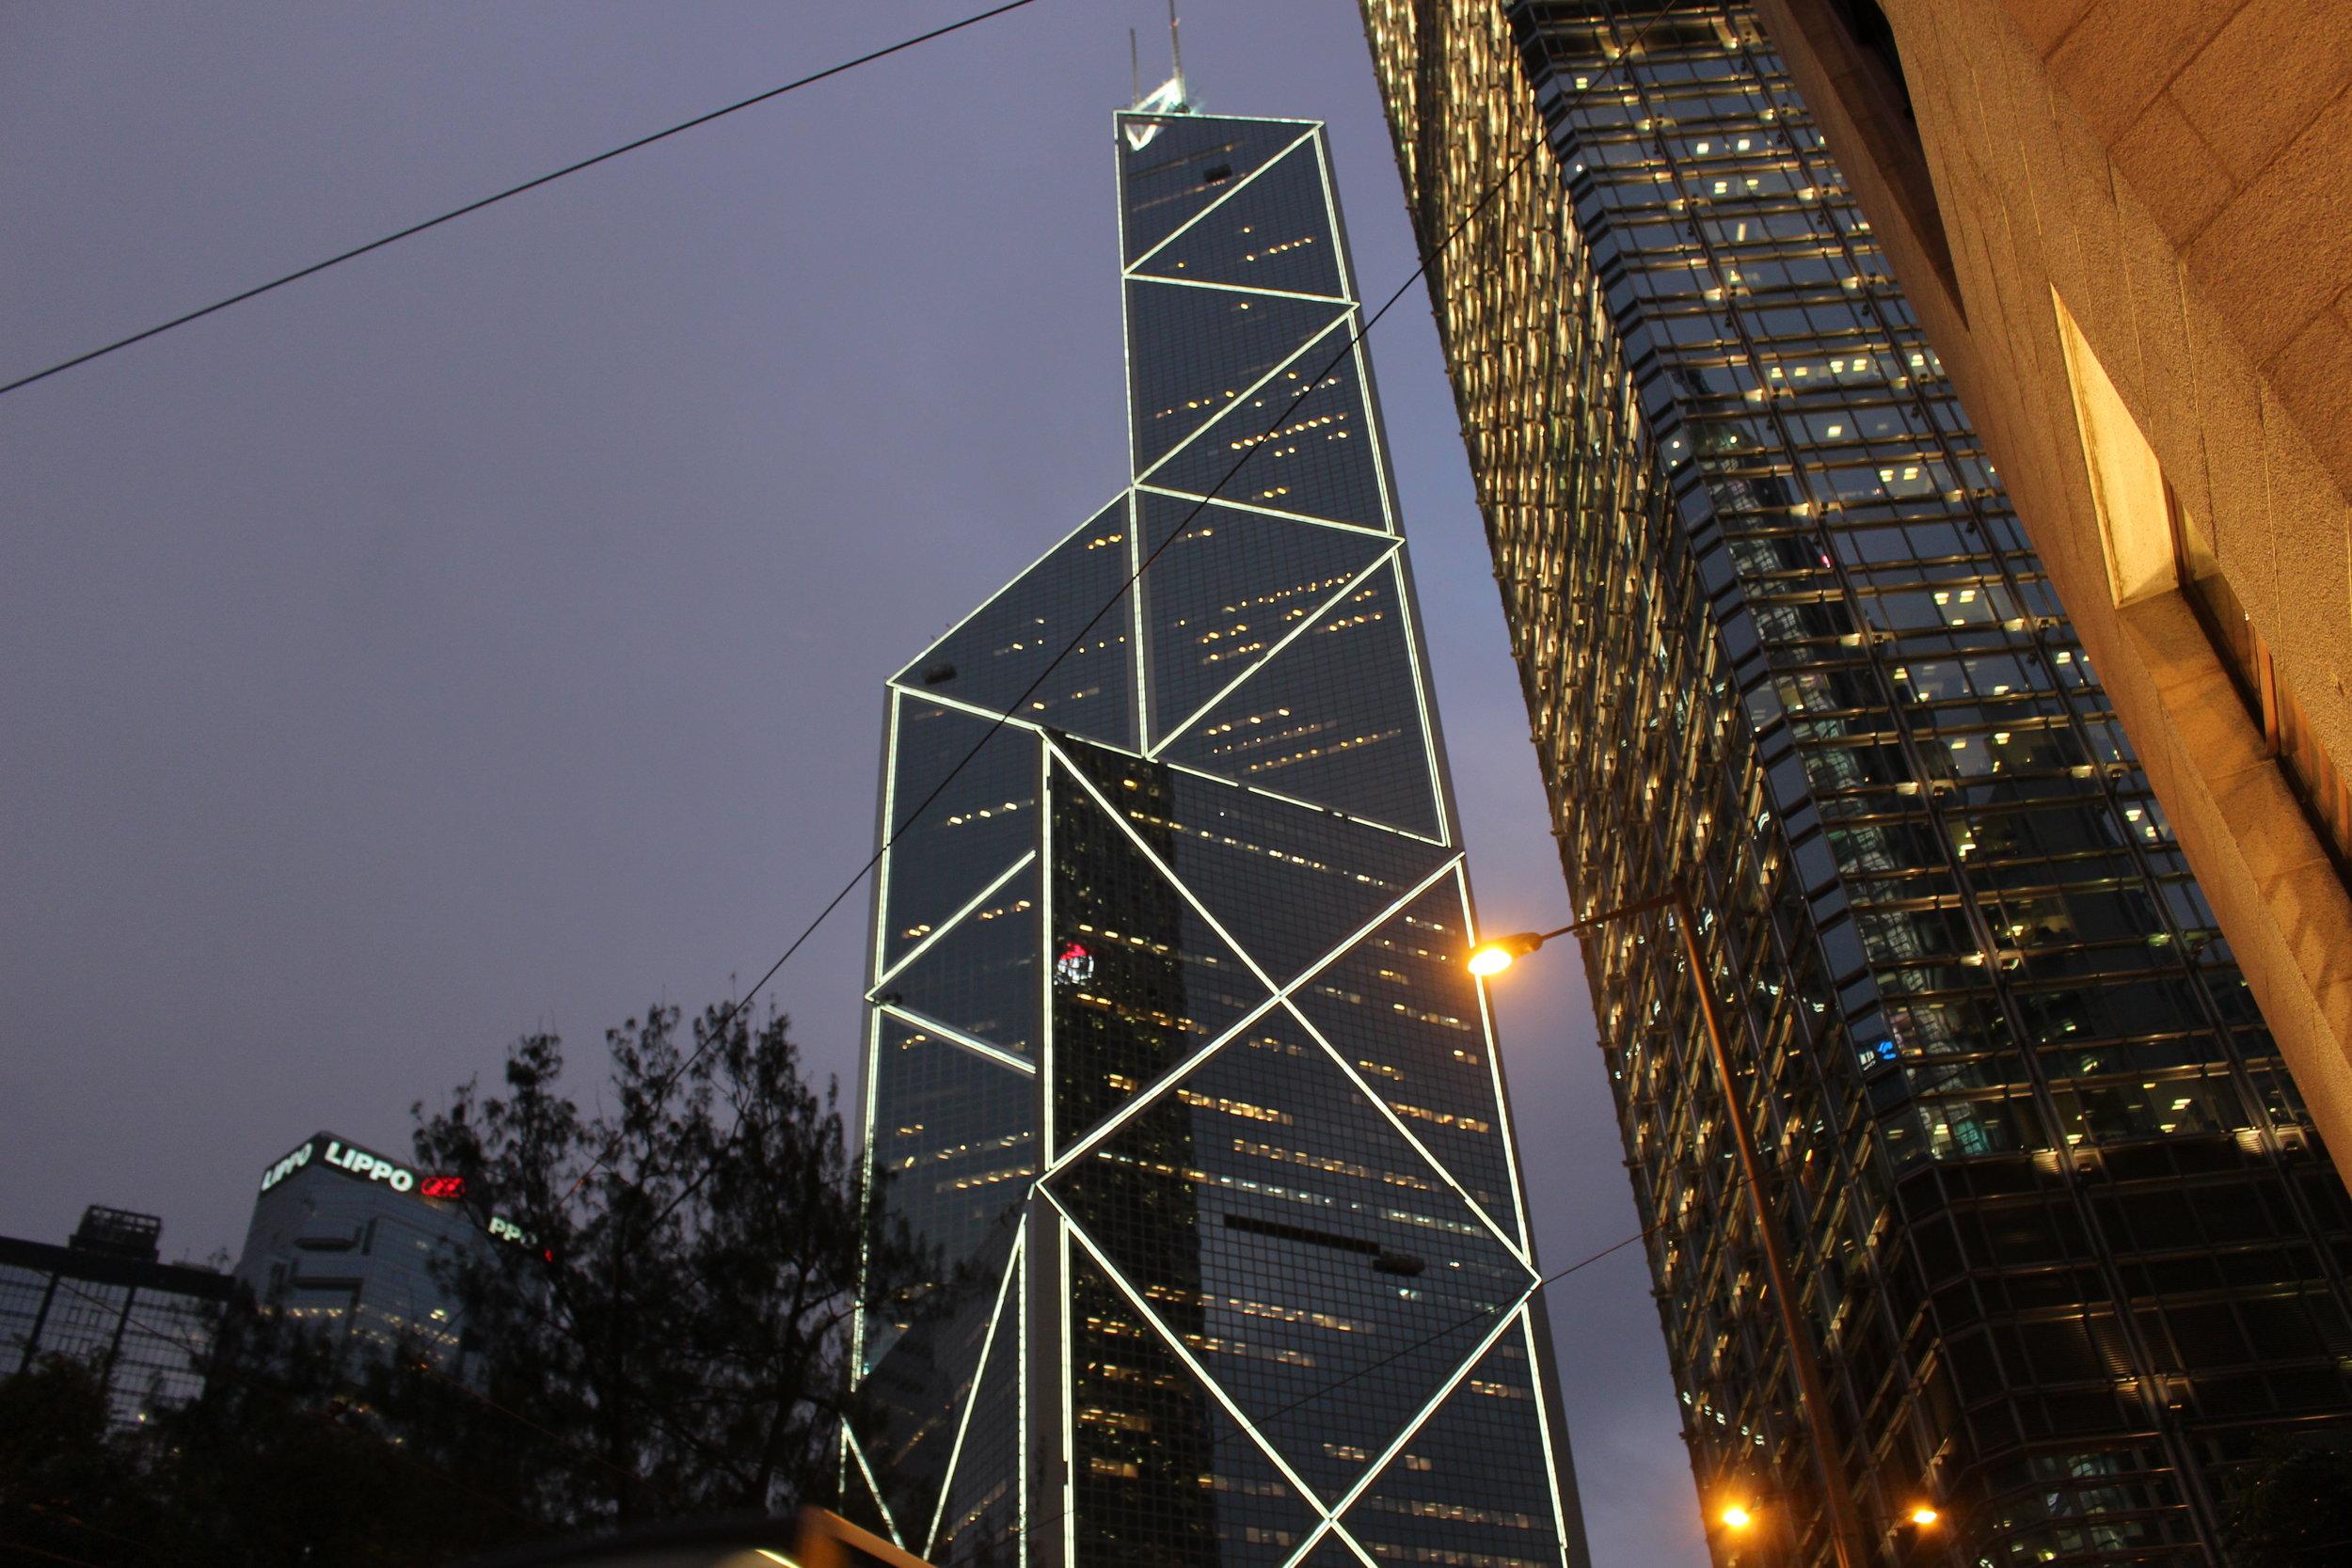 Walking past the Bank of China tower